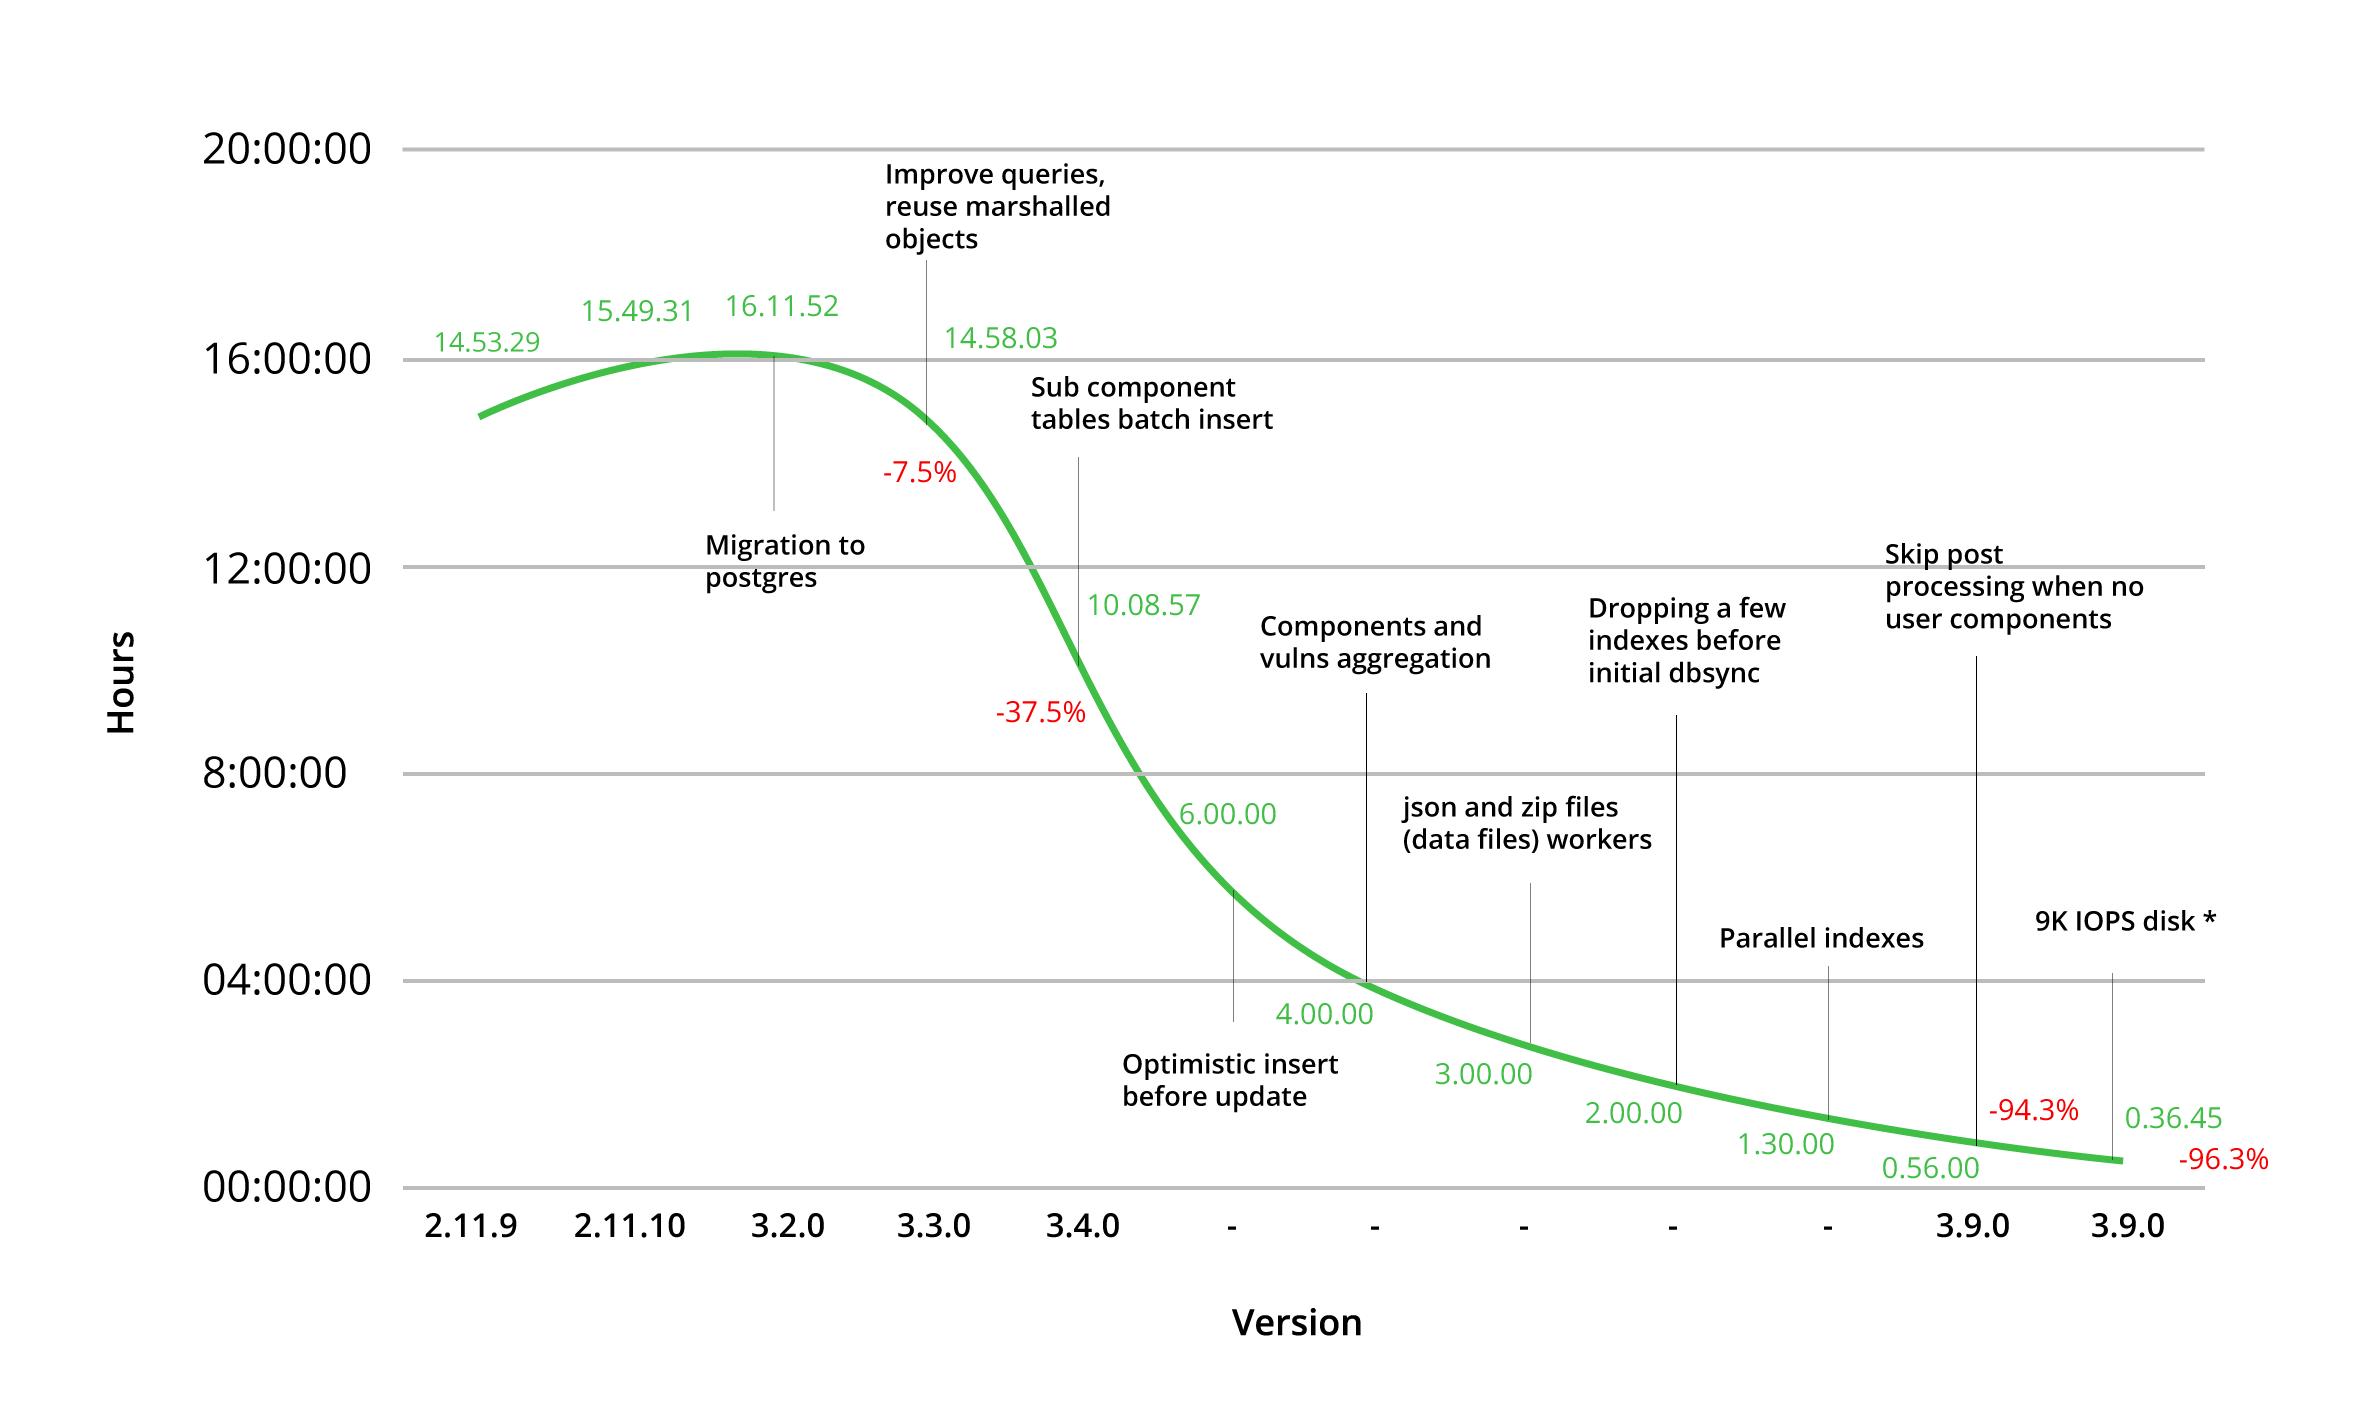 JFrog Xray Summary of Performance Improvement